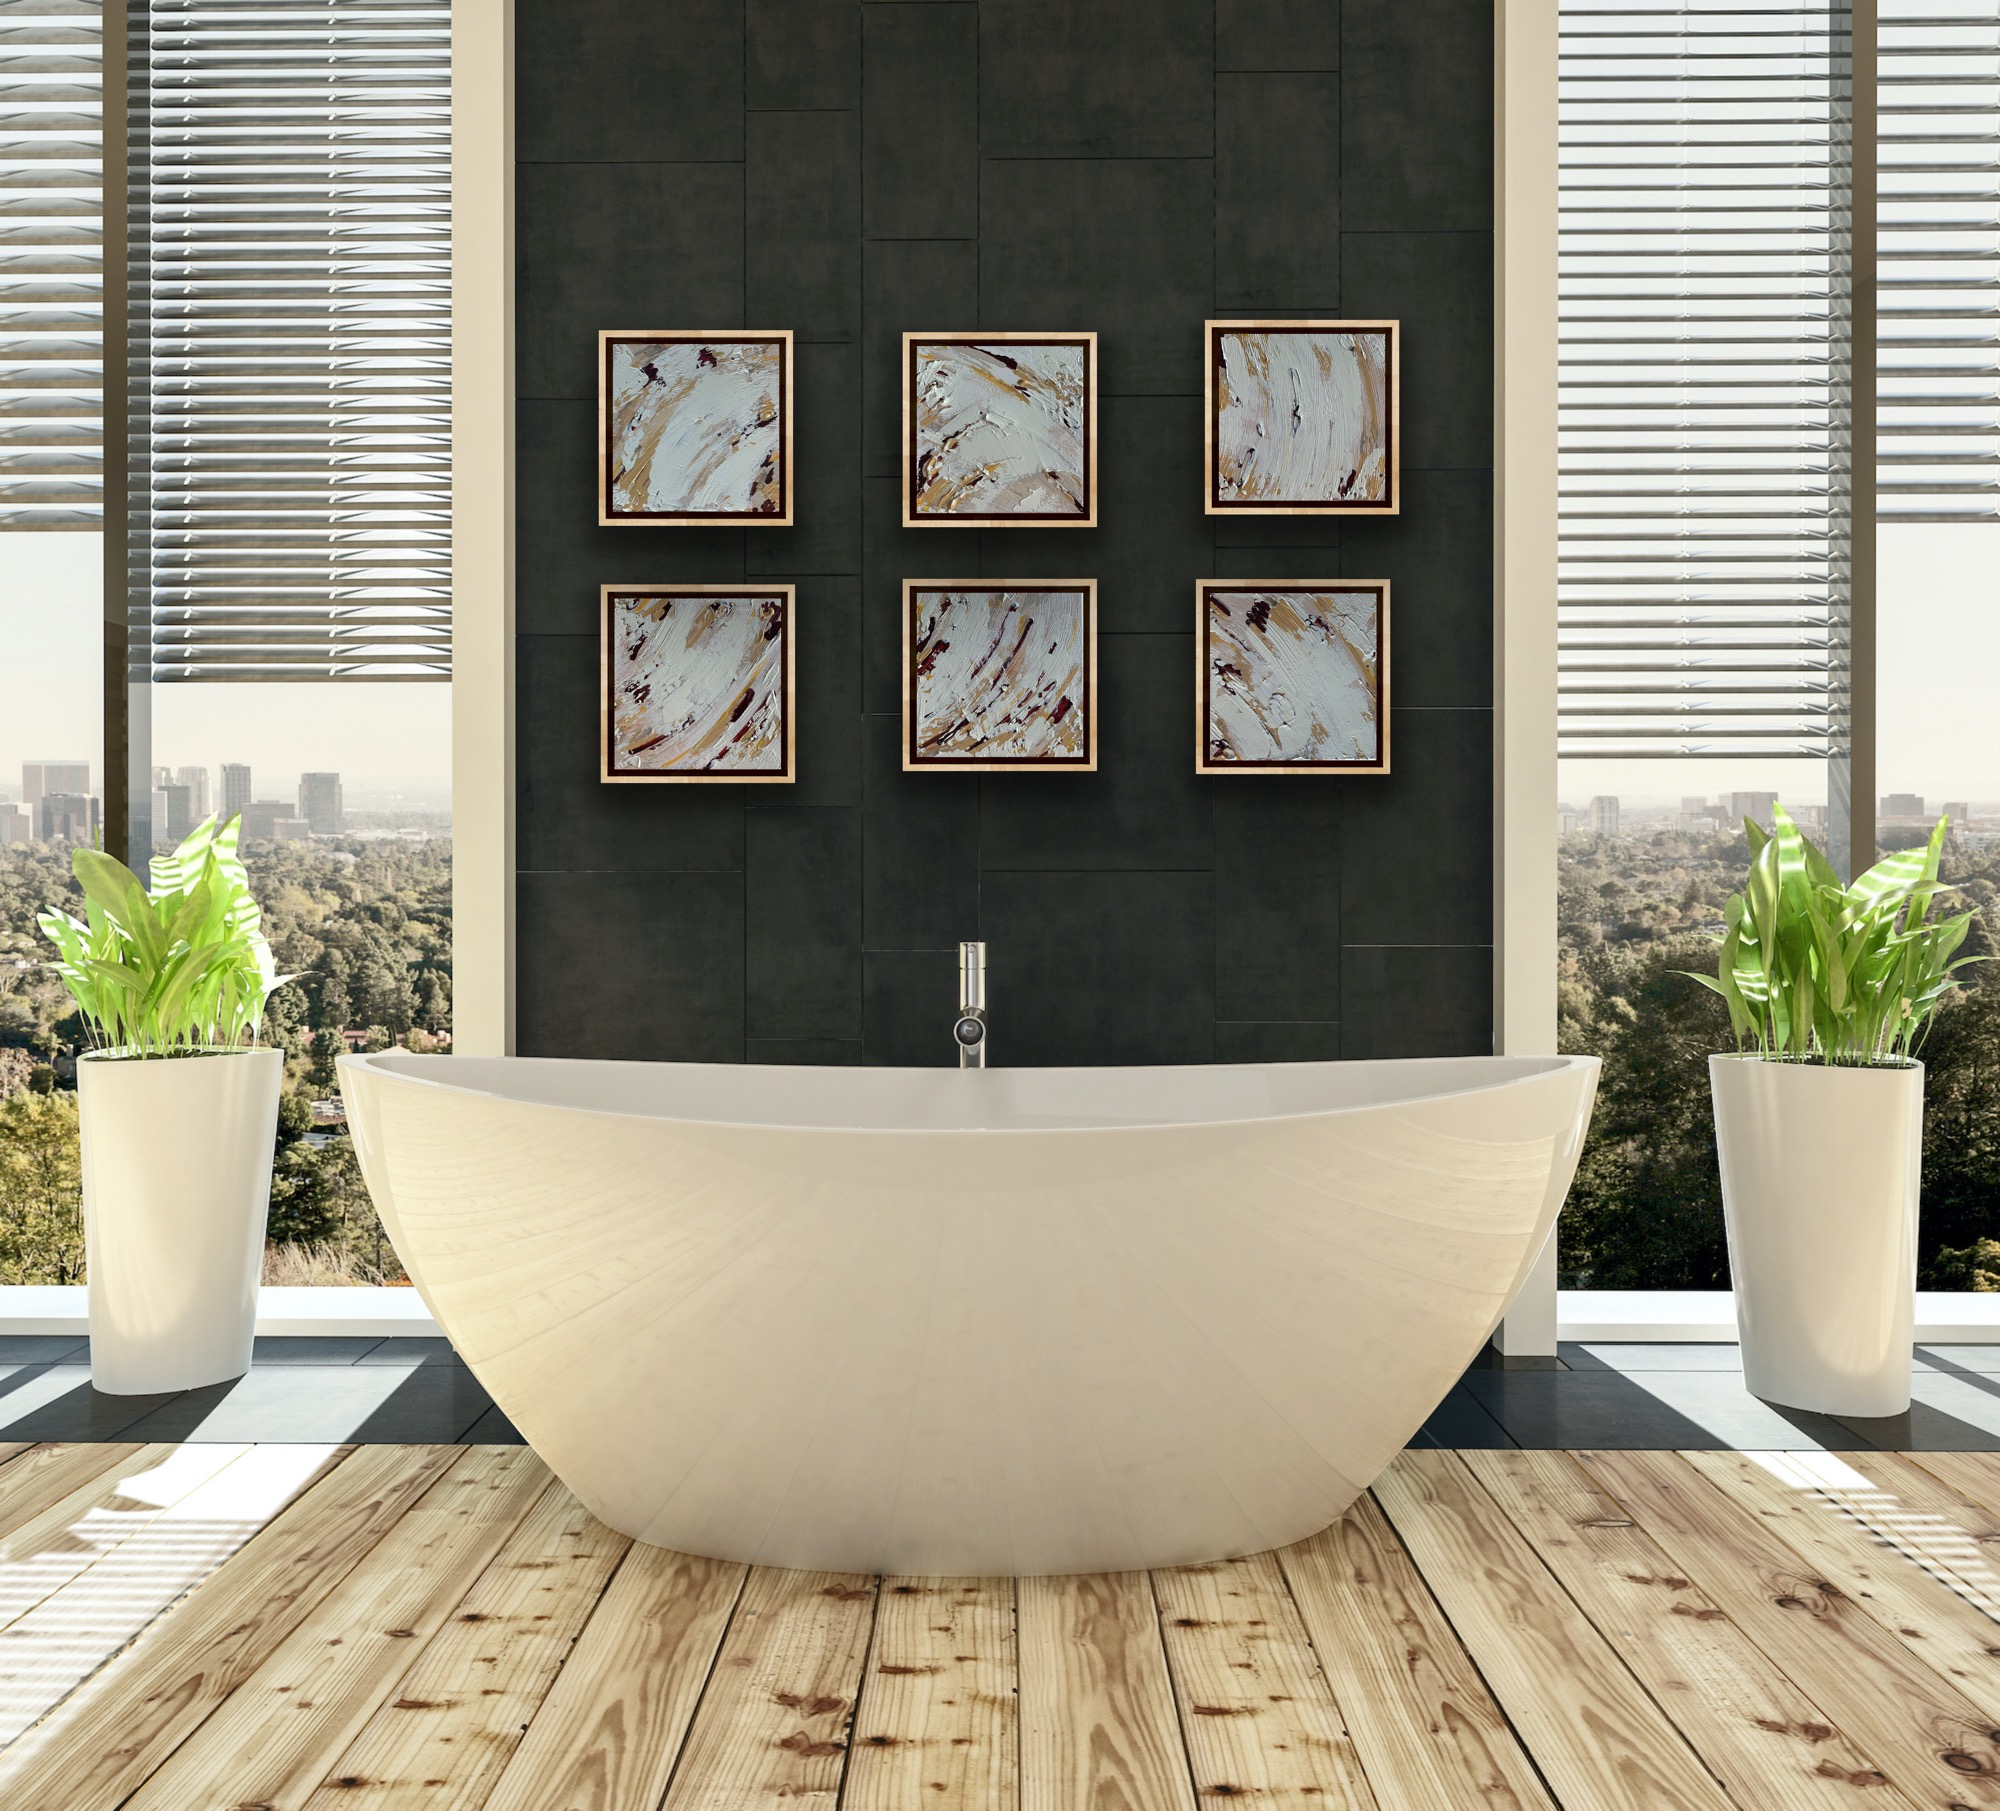 abstract art in luxury bathroom decor